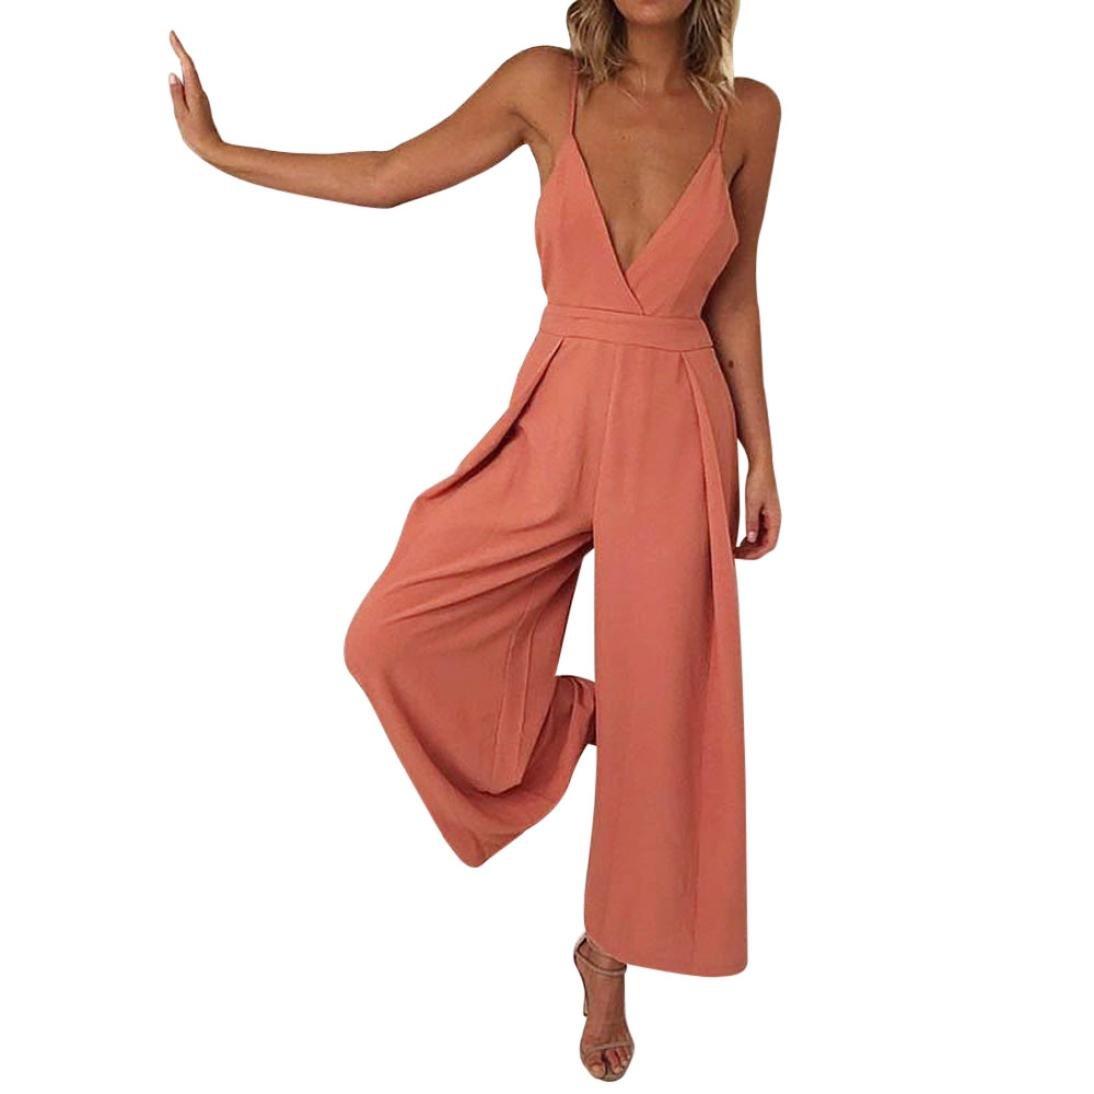 NEWONESUN Women Casual V Neck Back Bow Jumpsuit Clubwear Bodycon Playsuit (M, Orange)